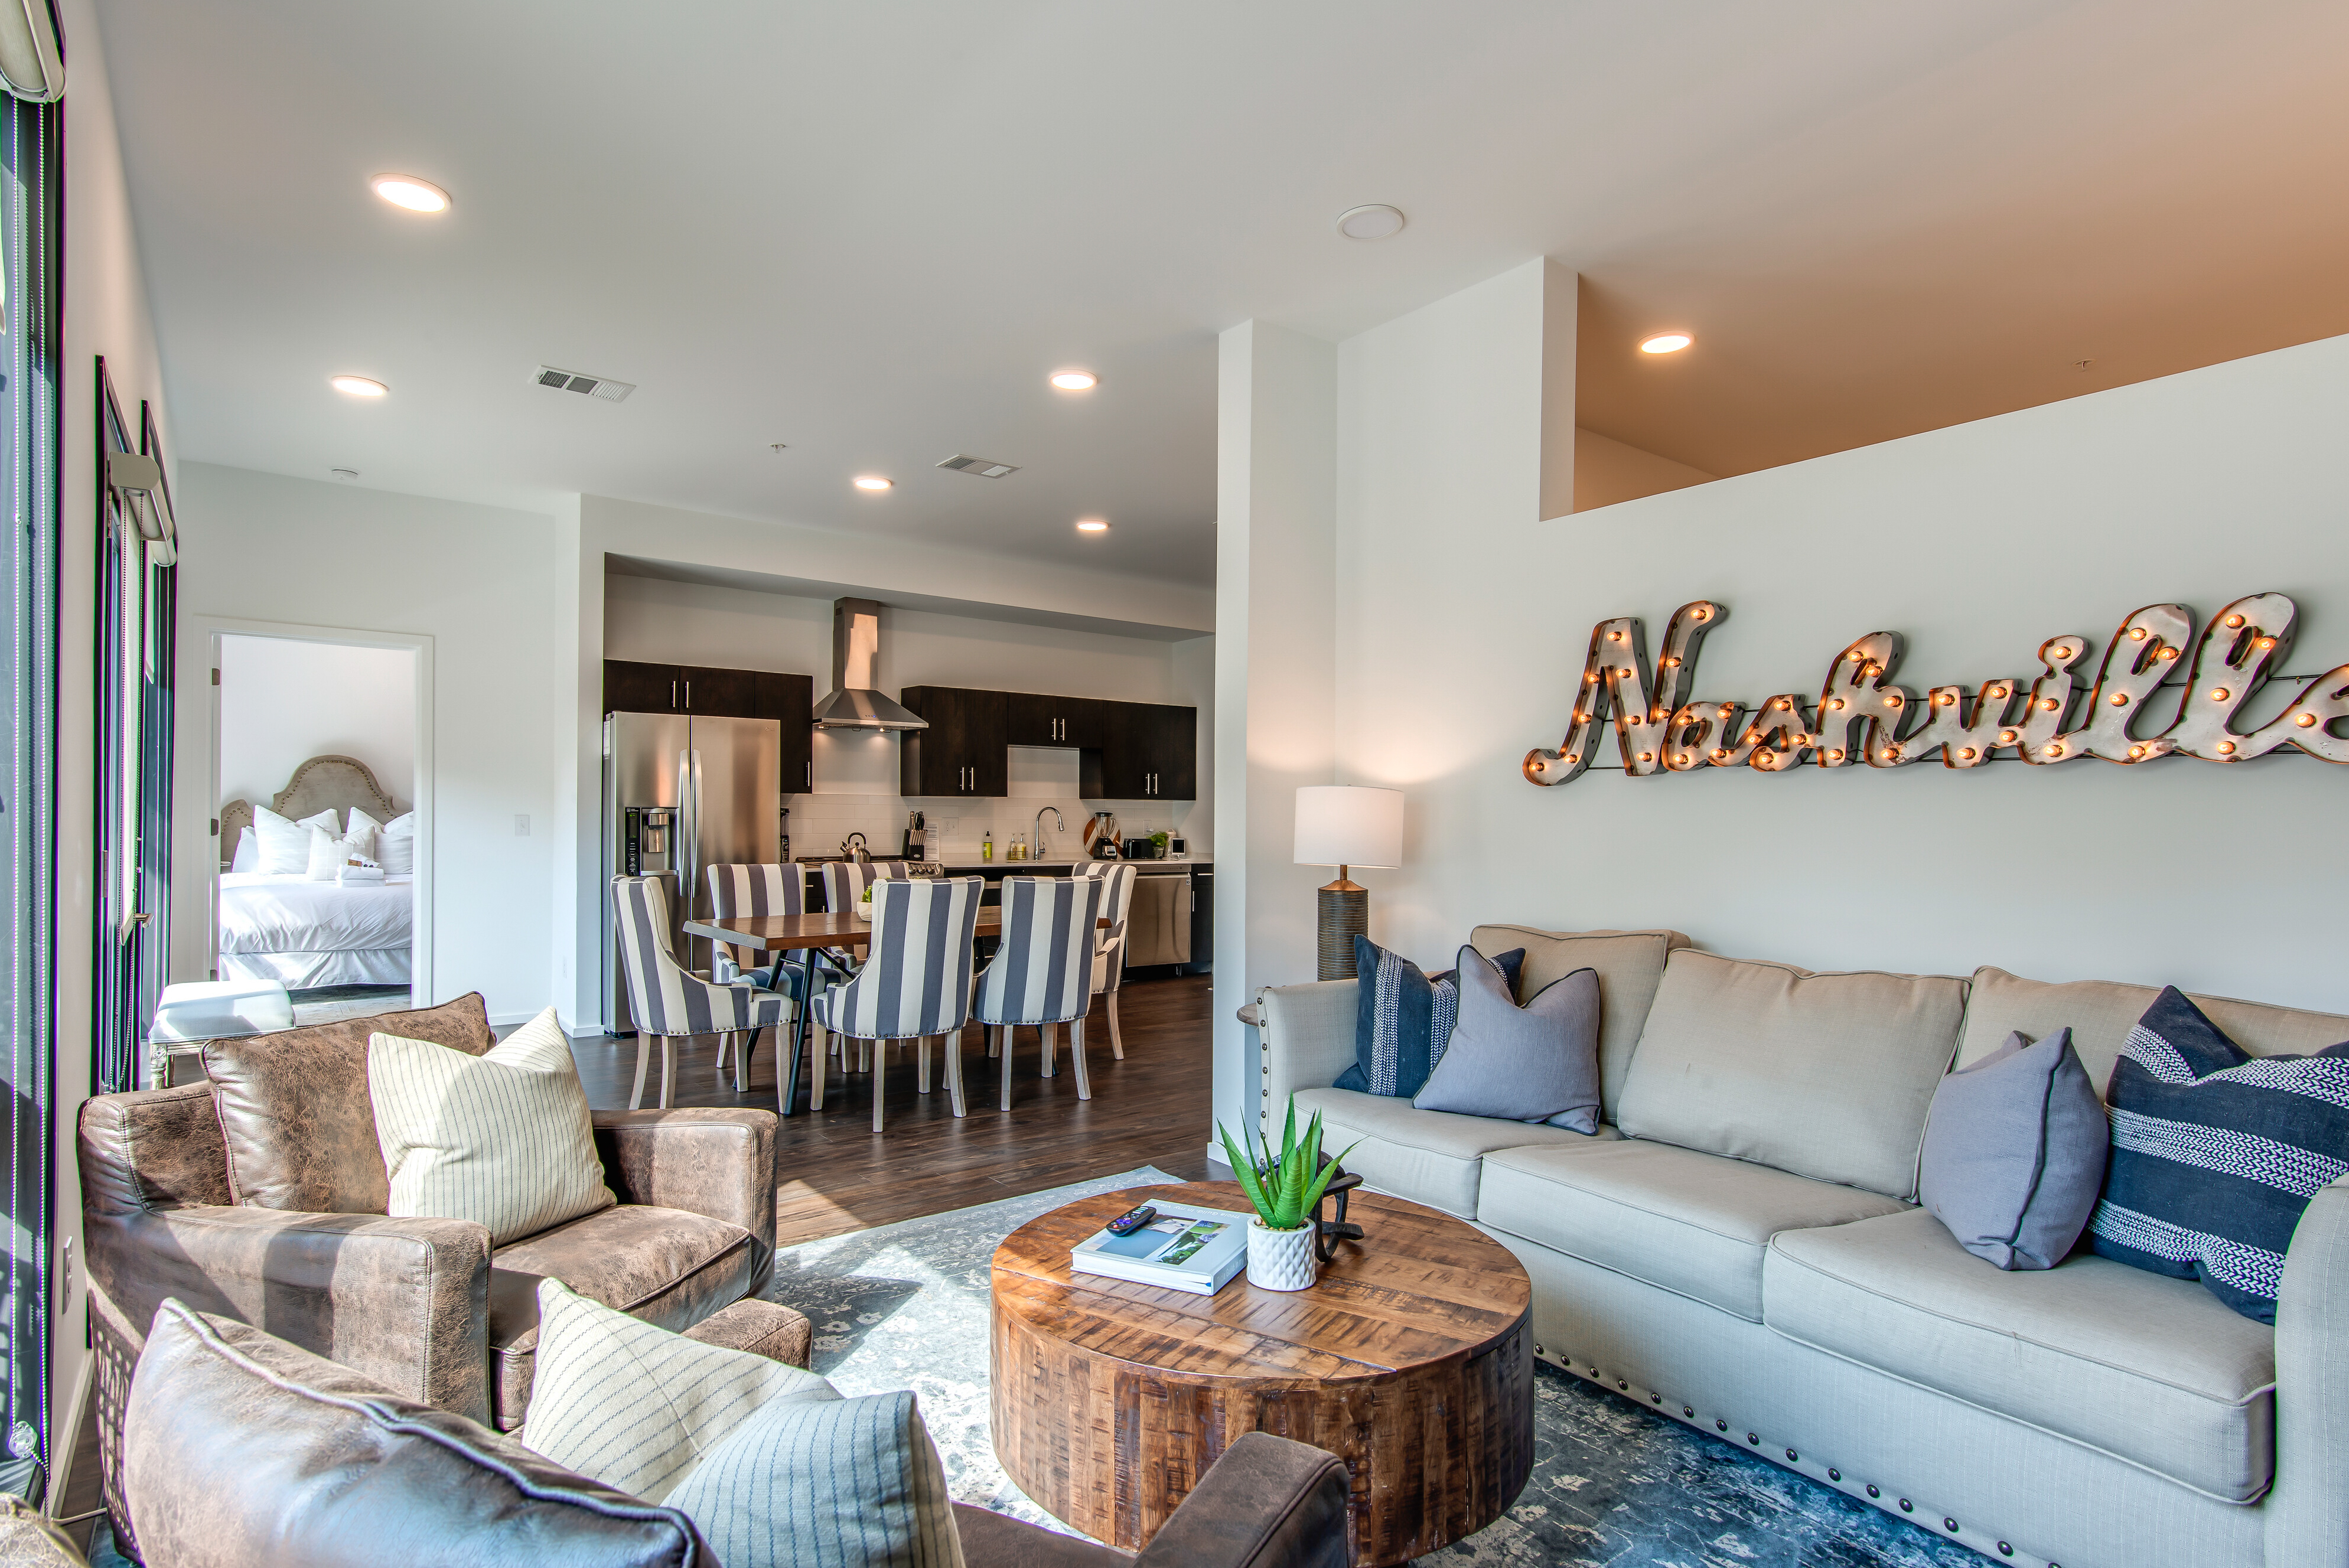 Nashville TN Vacation Rental Welcome to Illume